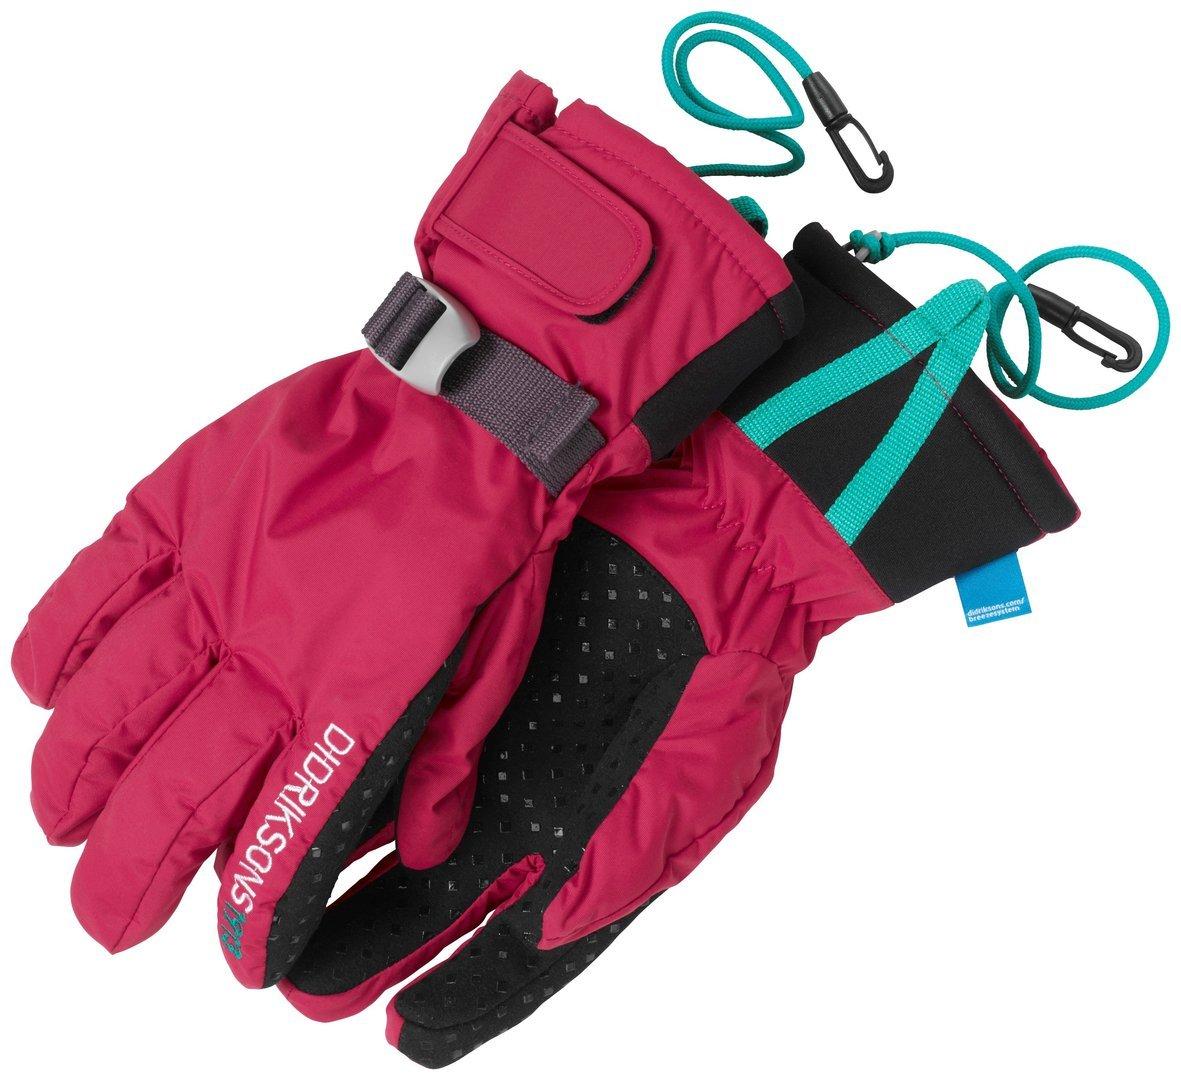 Didriksons Waterproof and Warm Five Youth Childrens Boys Girls Ski Gloves B00OL0KOPQ